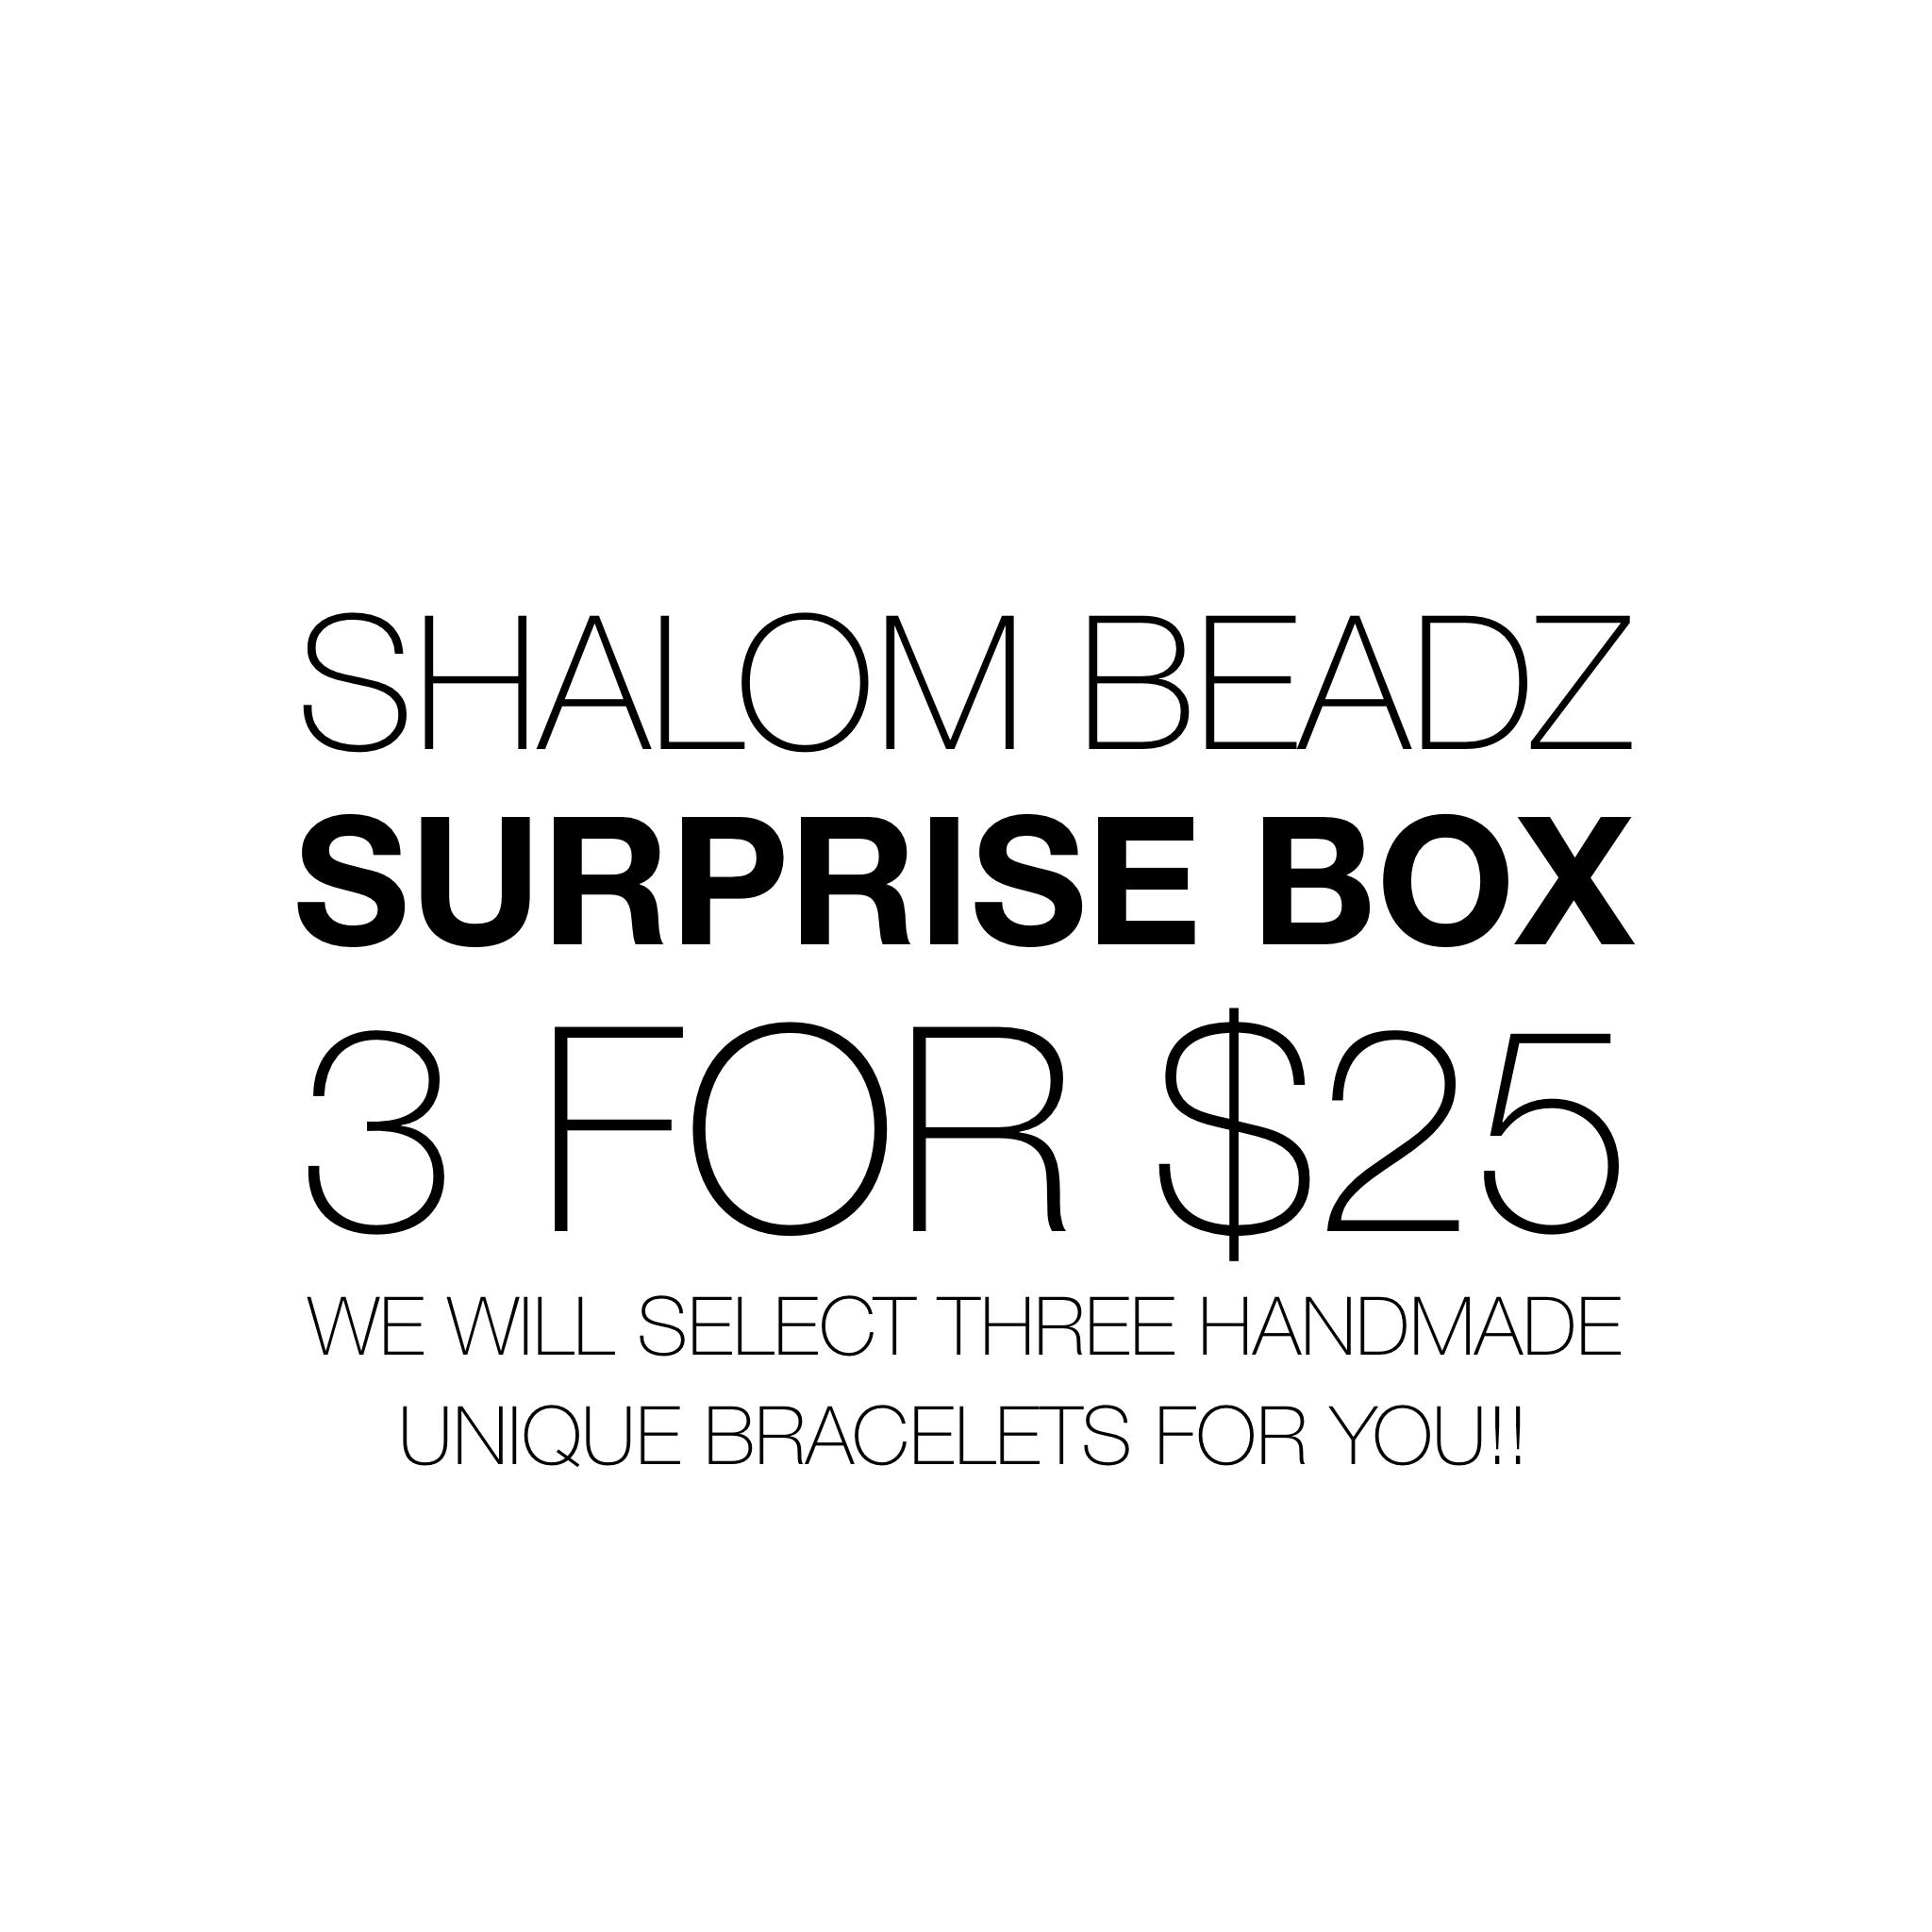 Shalom Beadz Surprise Box UPSB001-SURPRISEBOX